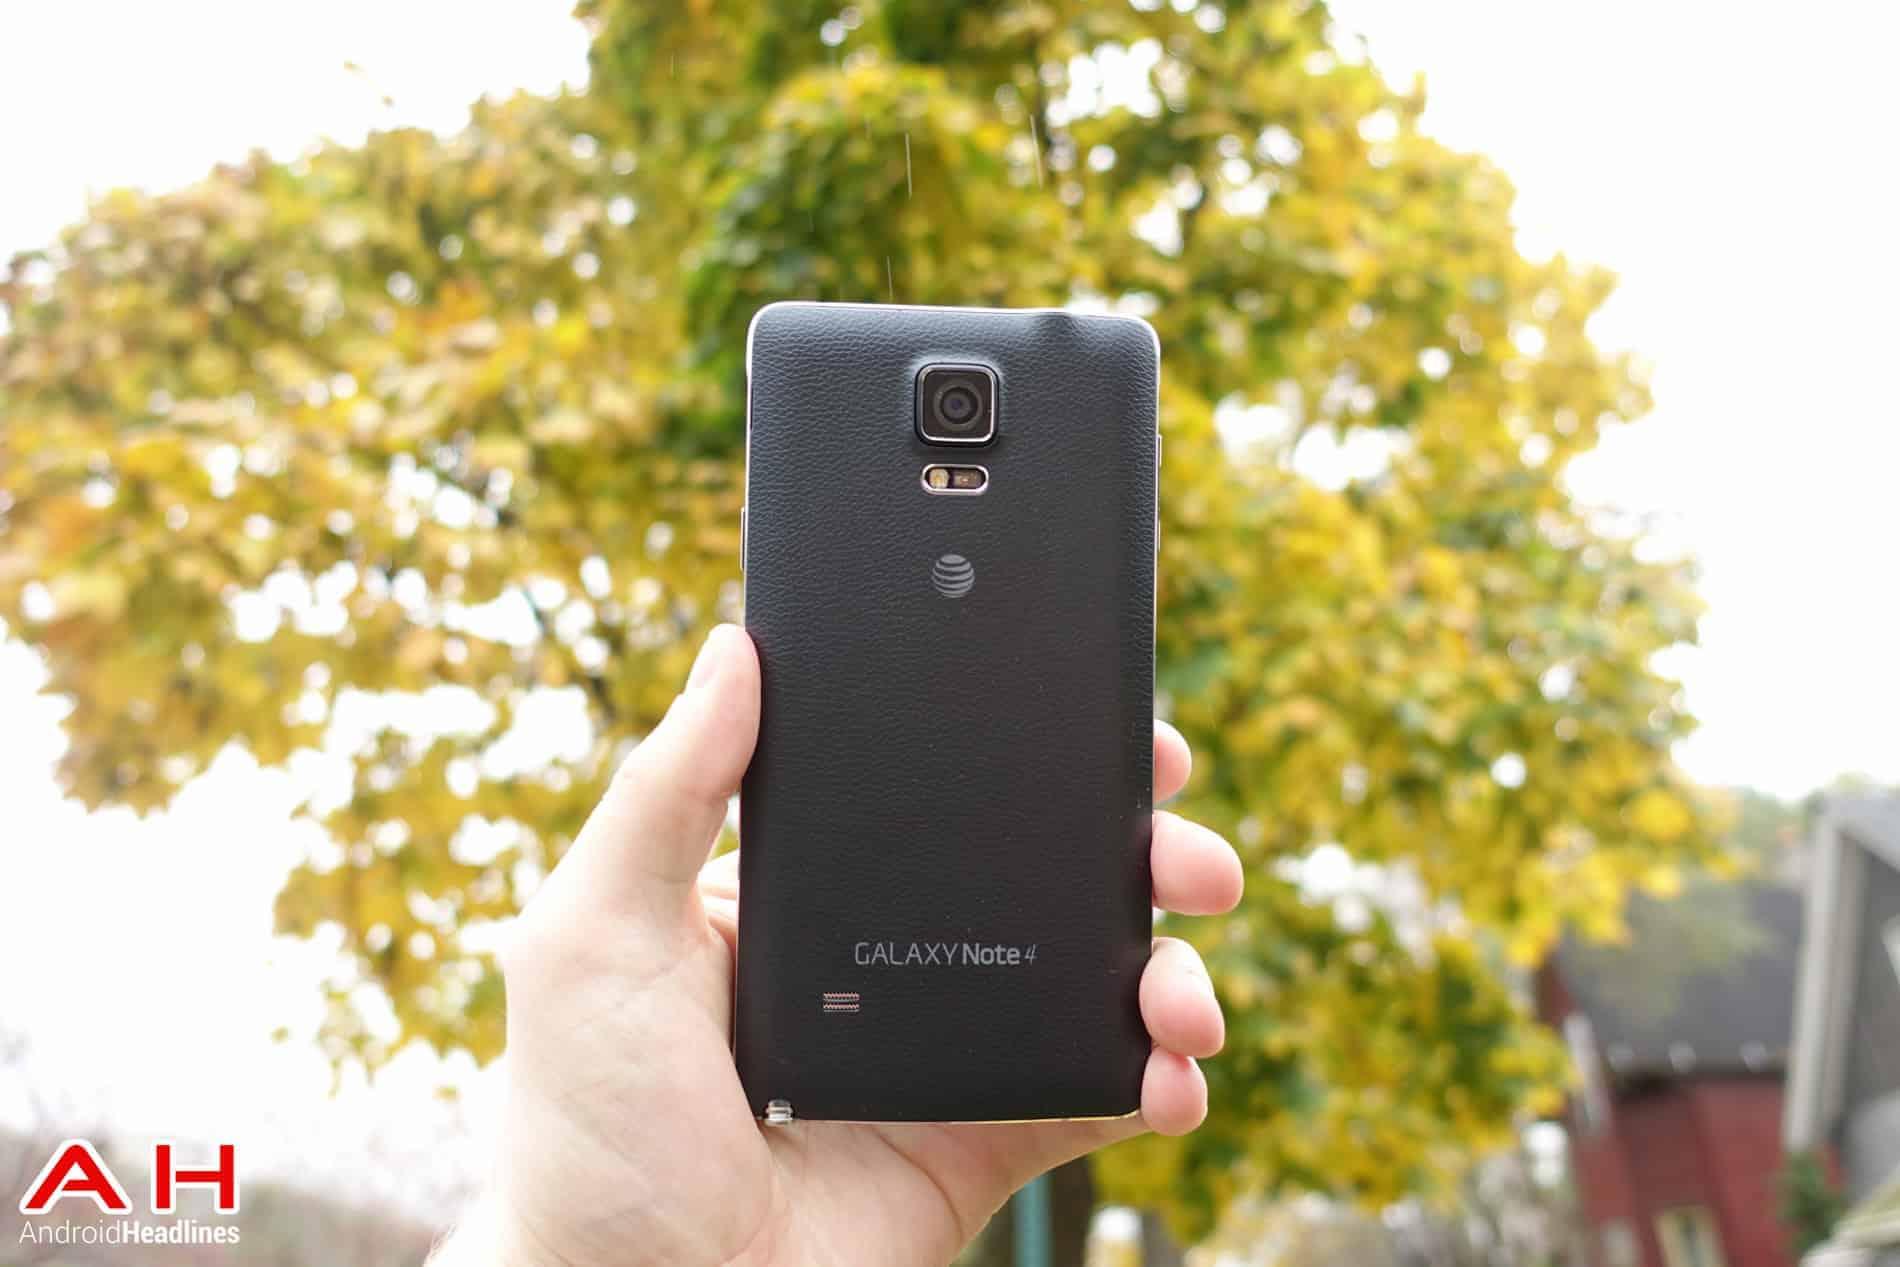 Samsung-Galaxy-Note-4-AH-9